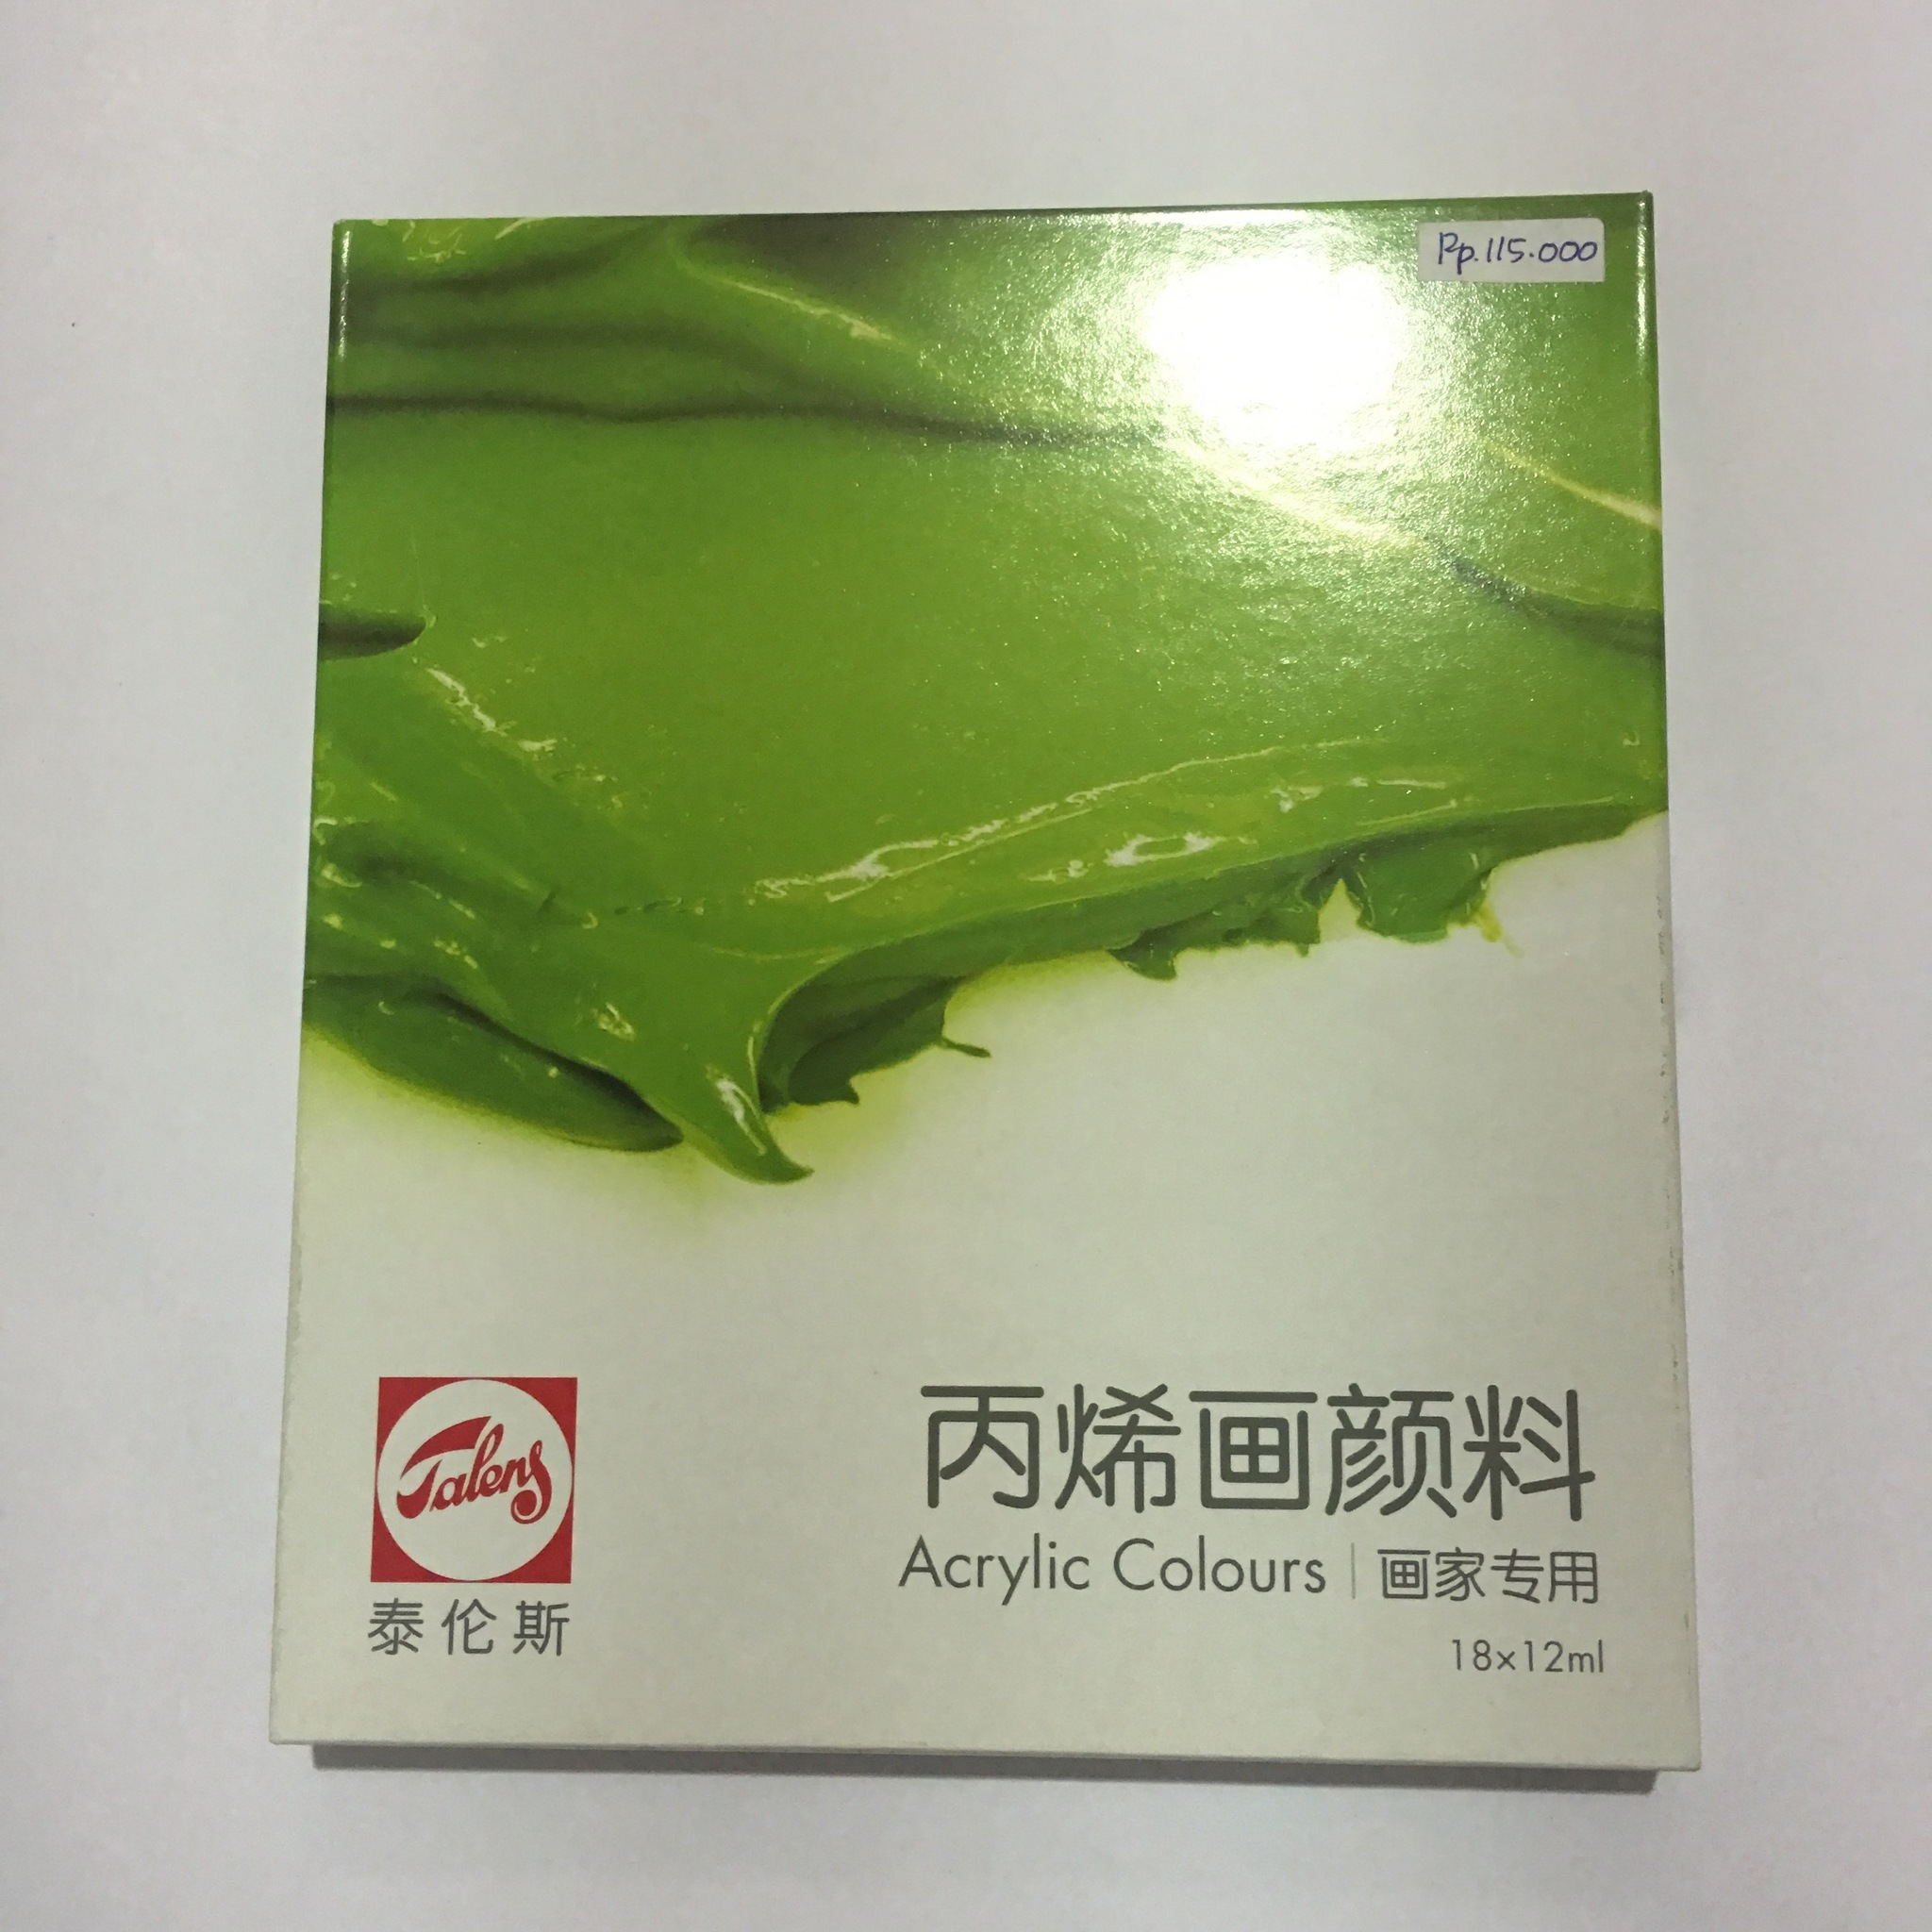 TALENS CHINA ACRYLIC COLORS 18 x 12 ML